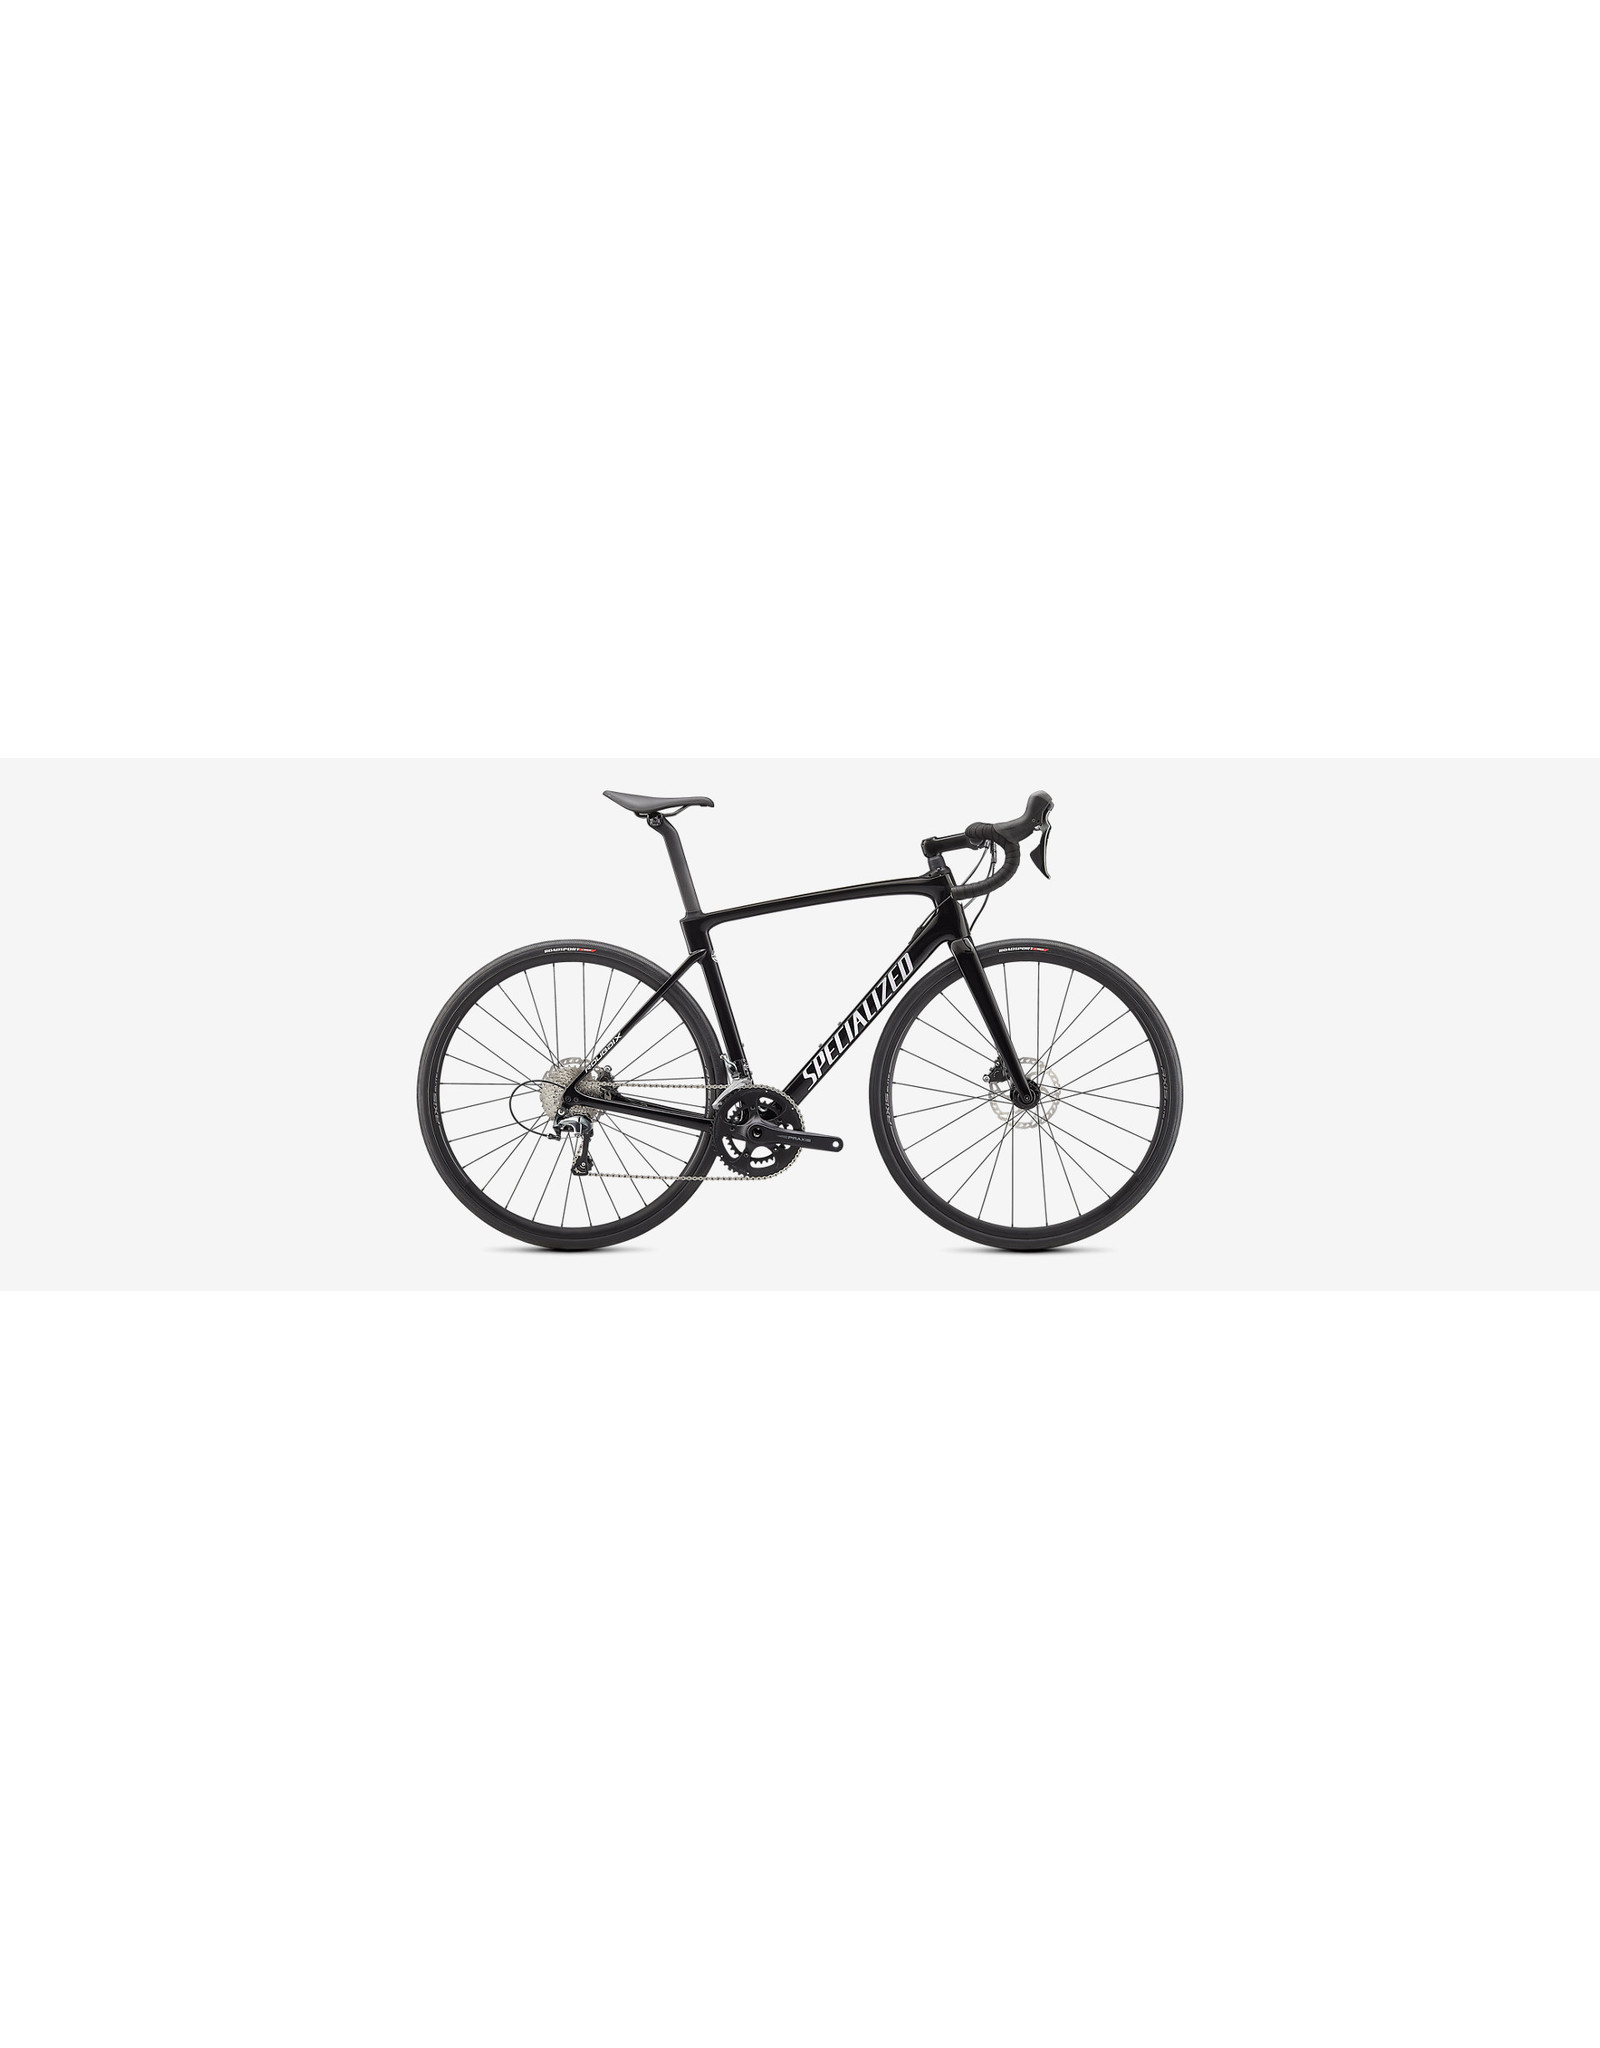 Specialized 21 Spec Roubaix Tarblk/Abln 58